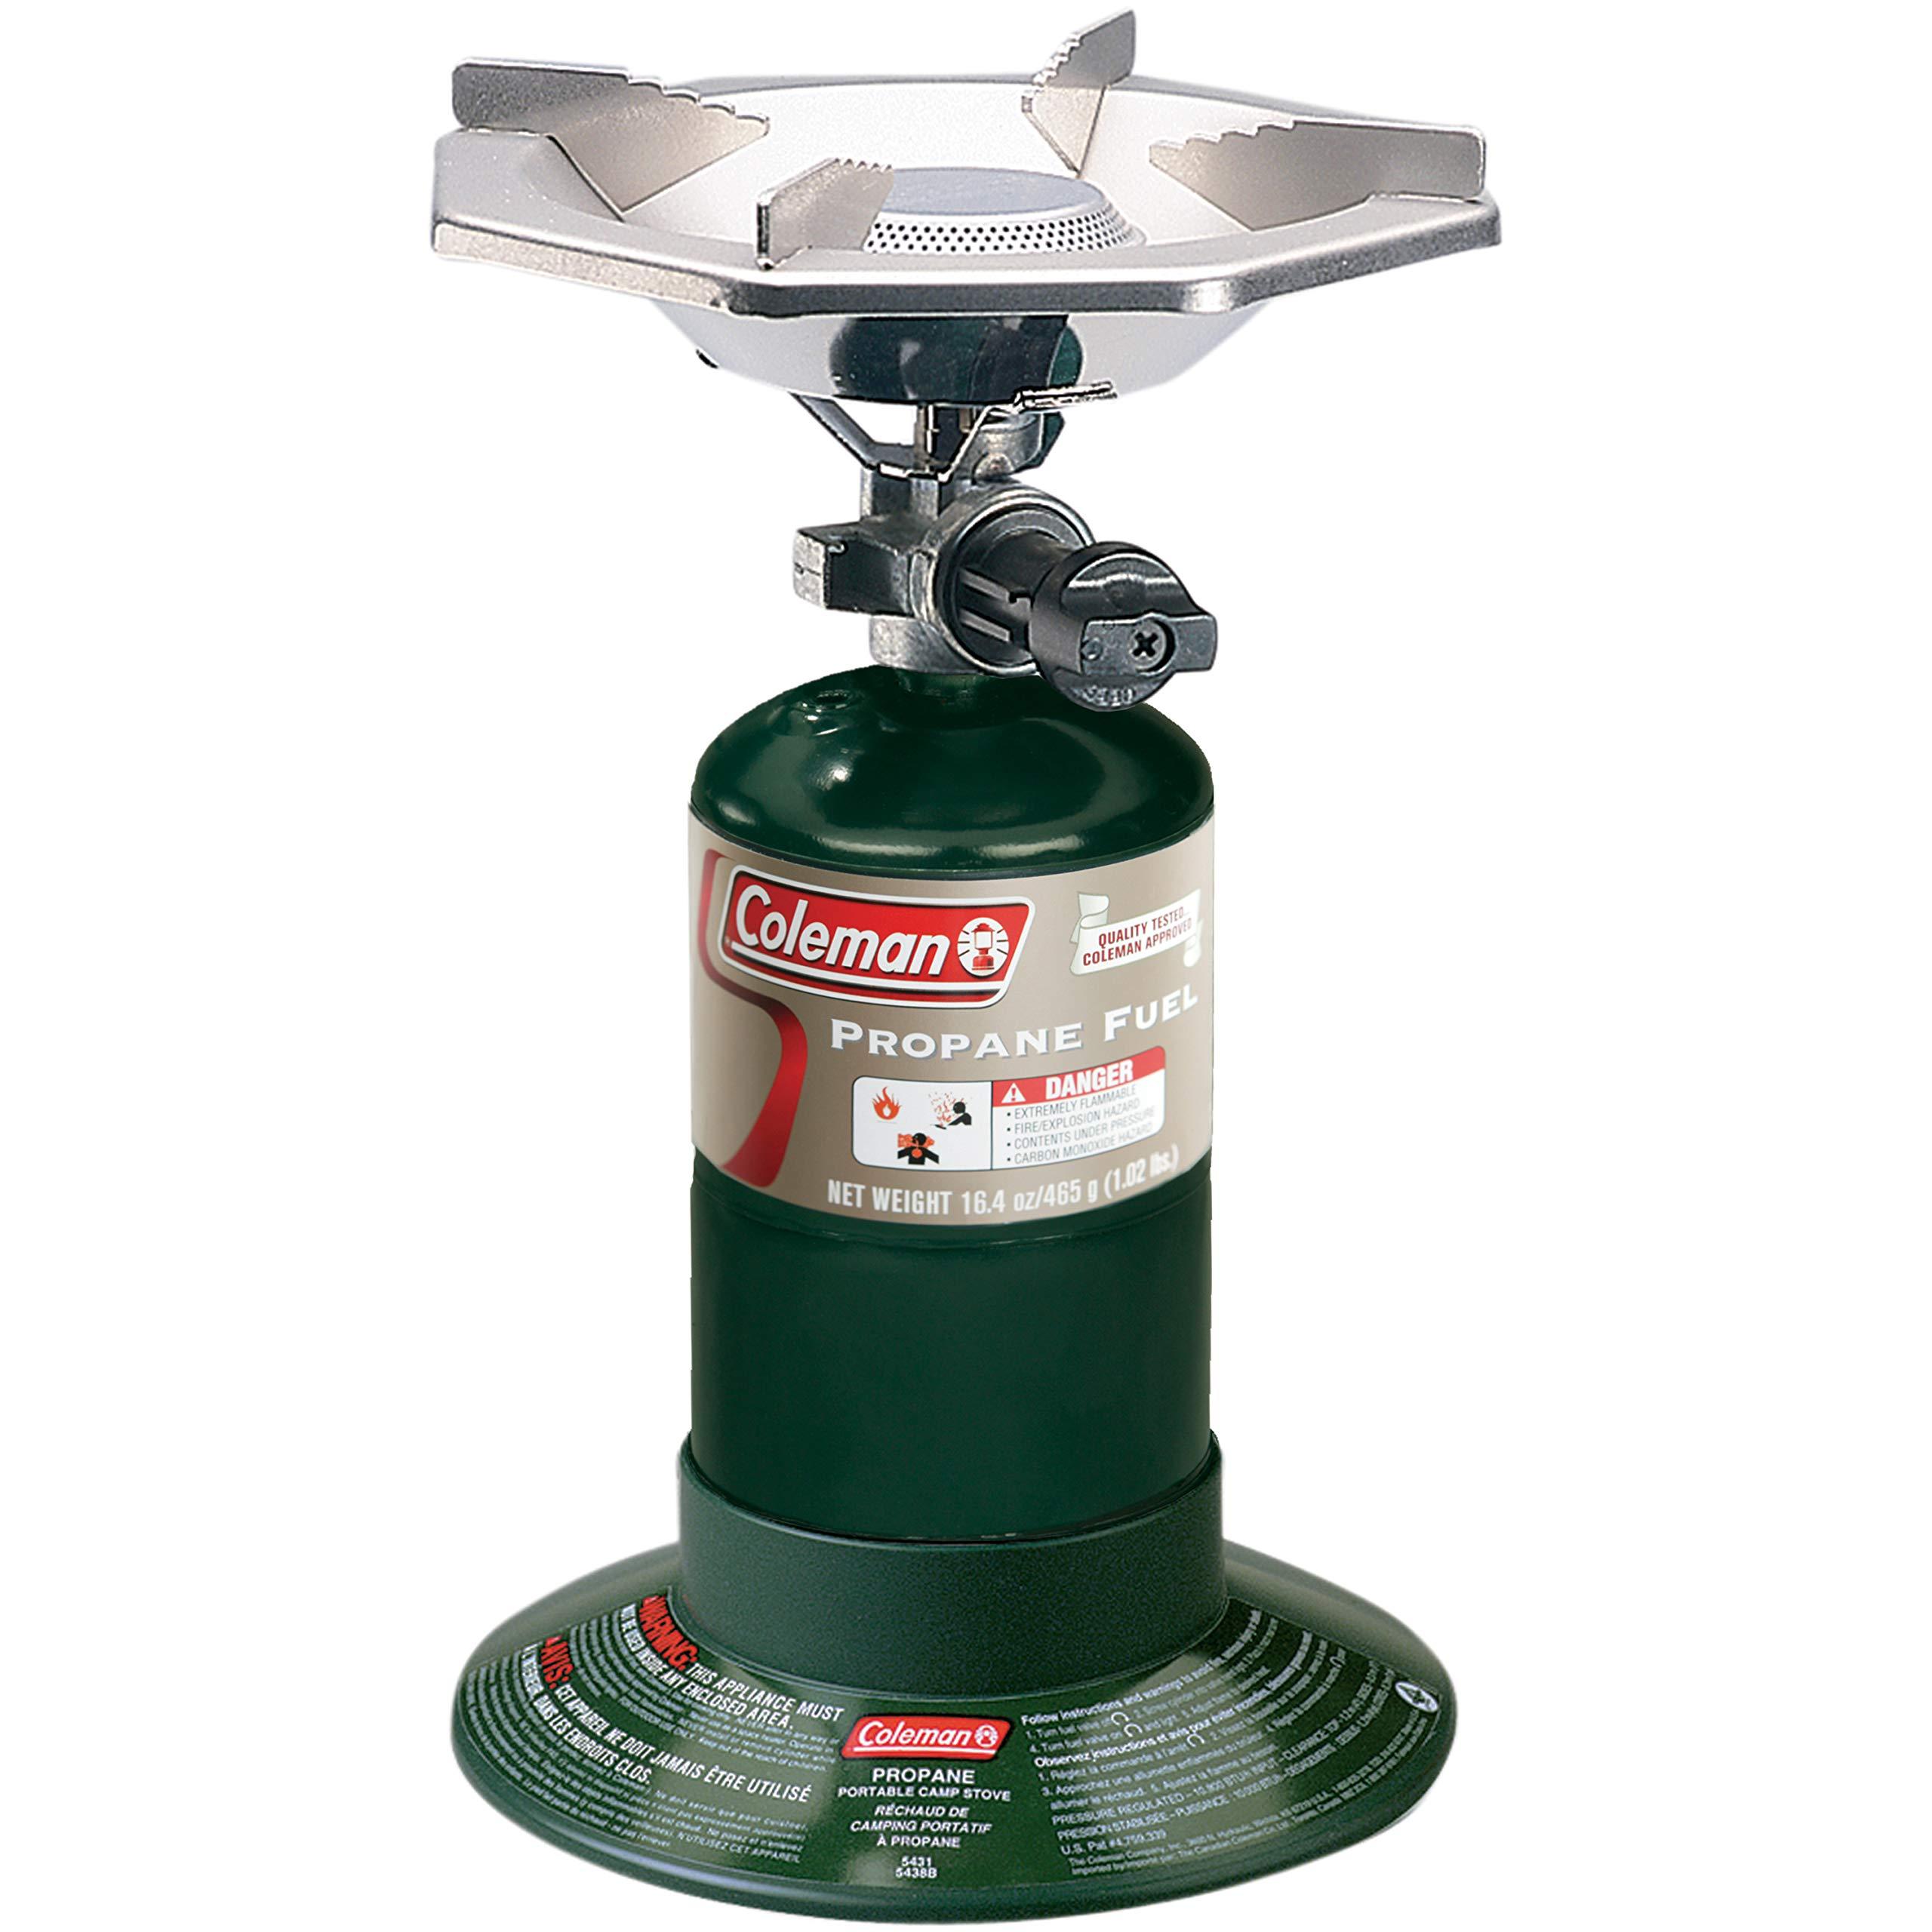 Coleman Bottle Top Propane Stove,Green,6.62'' H x 7.81'' W x 7.75'' L